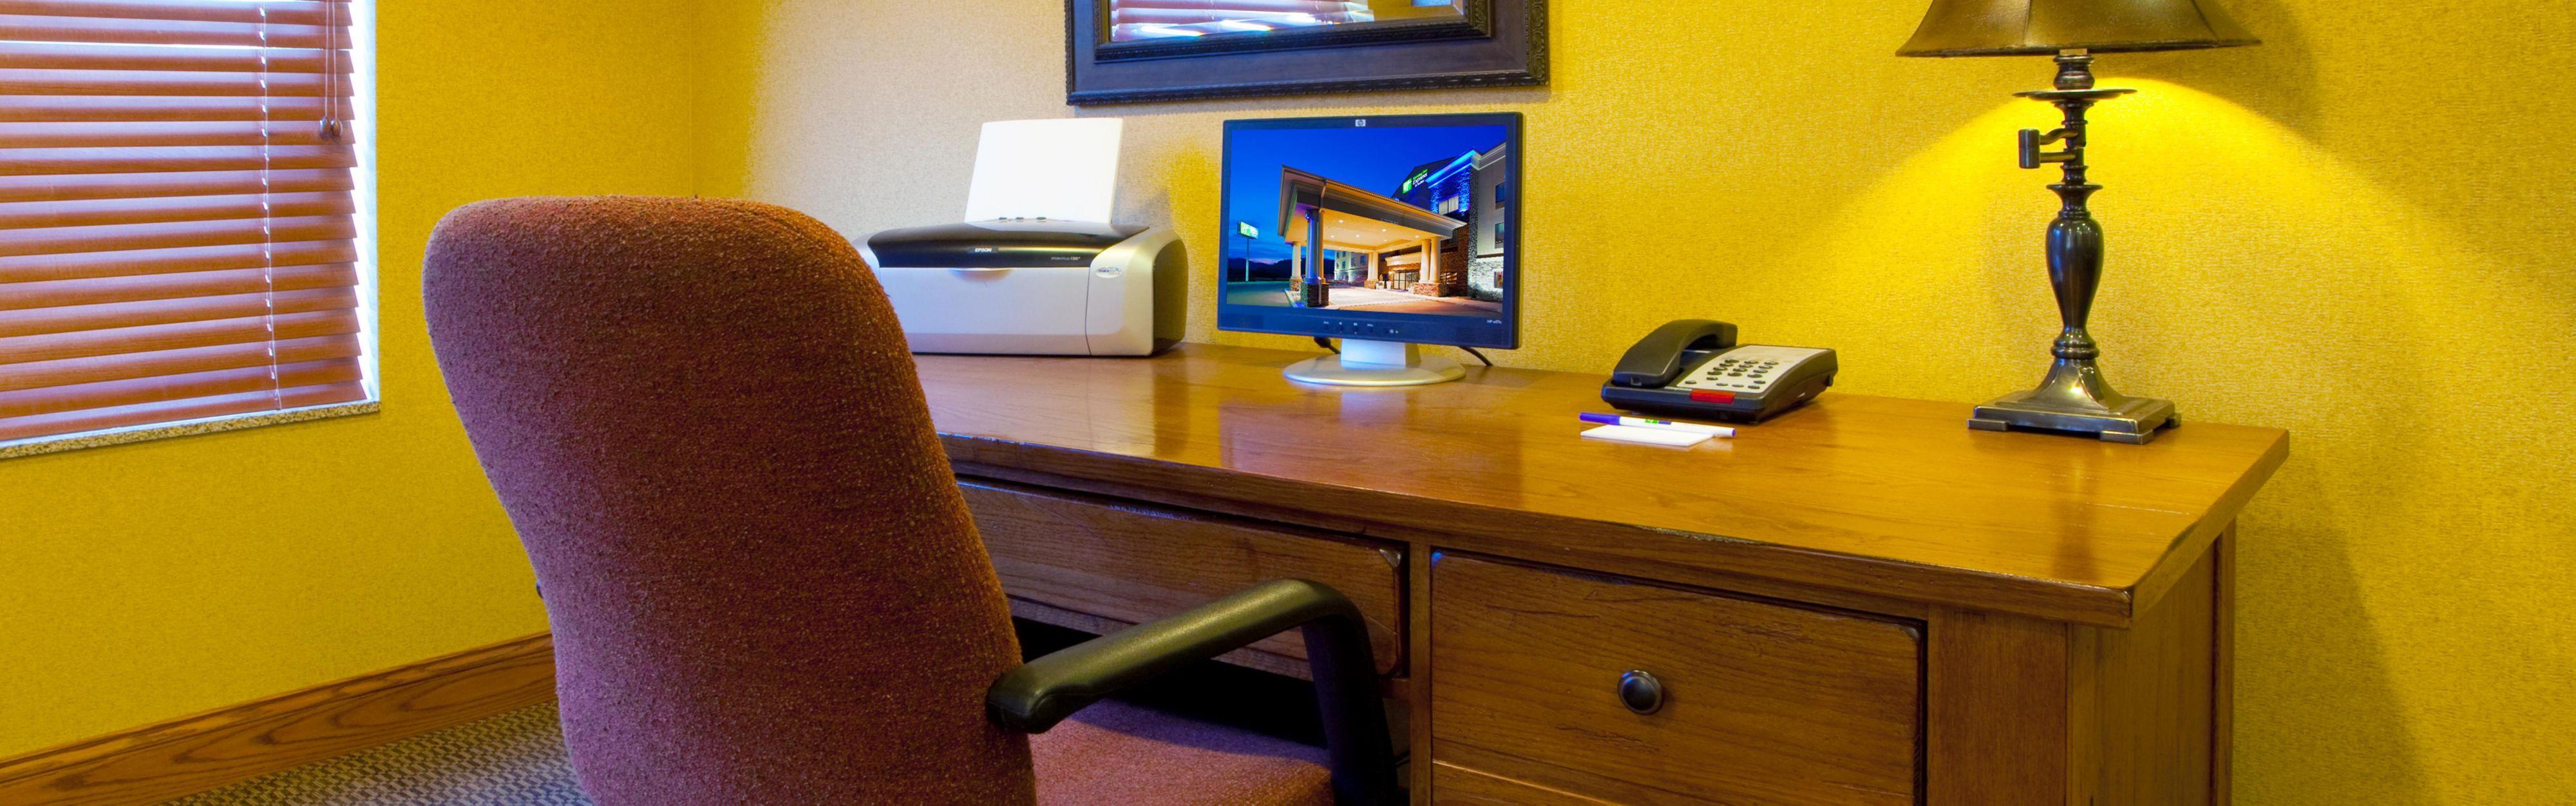 Holiday Inn Express & Suites Weston image 2